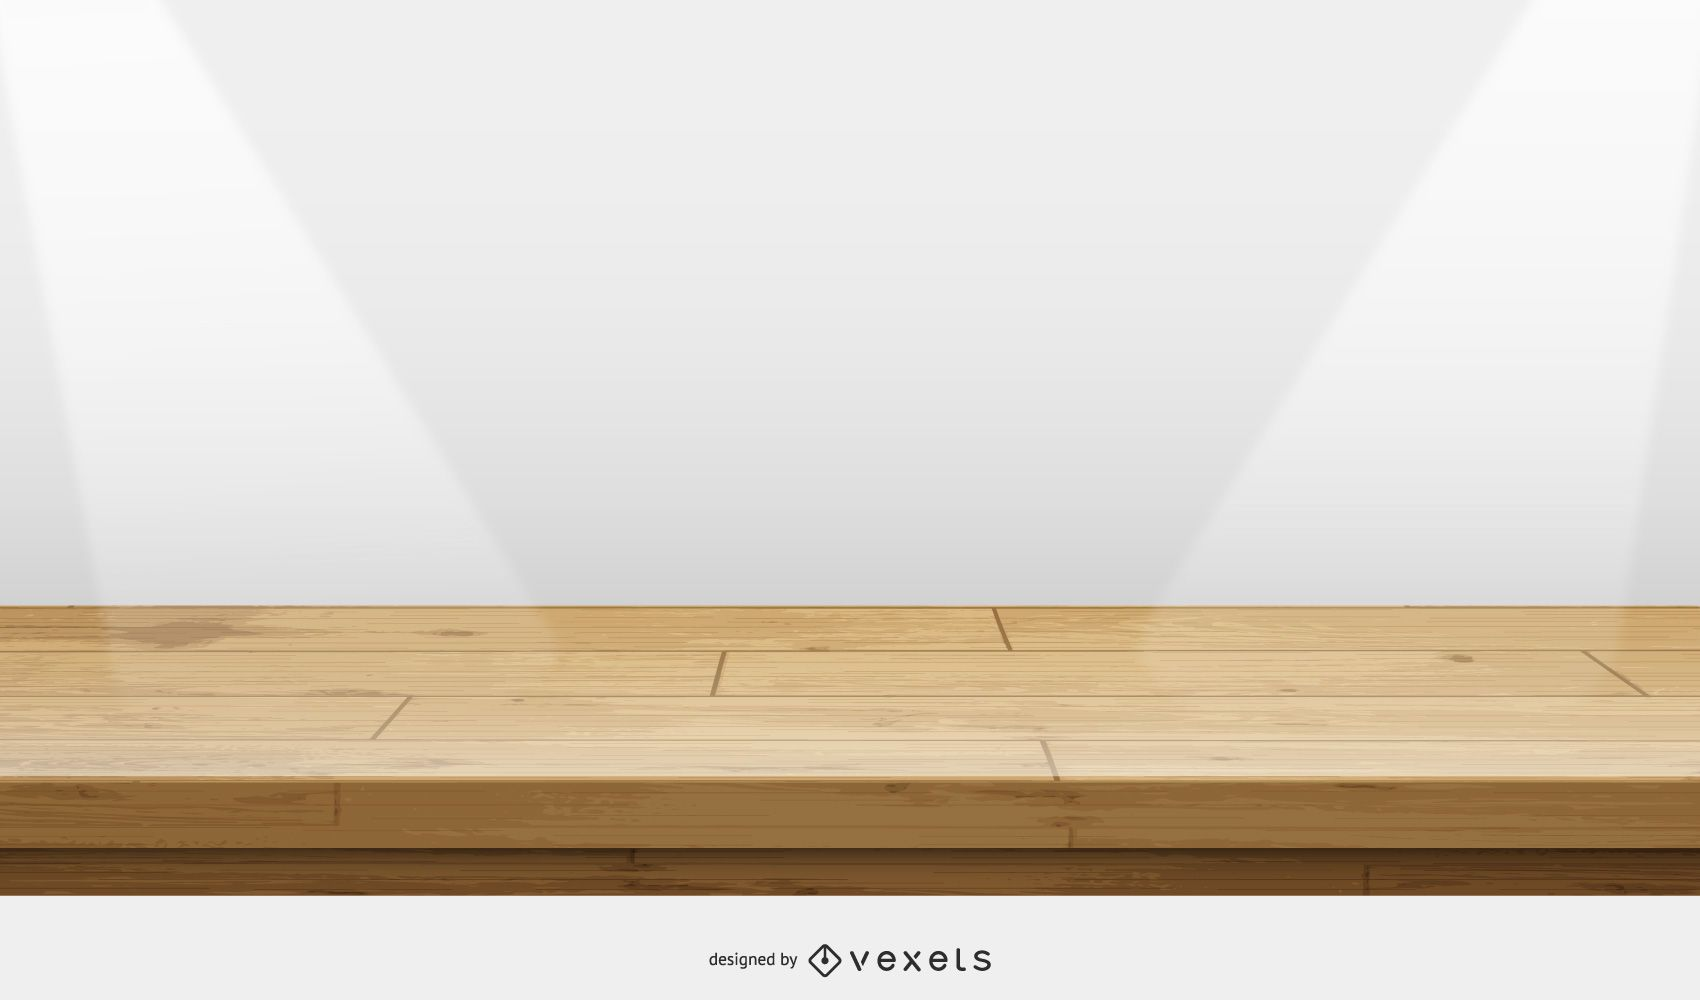 wooden stage illustration